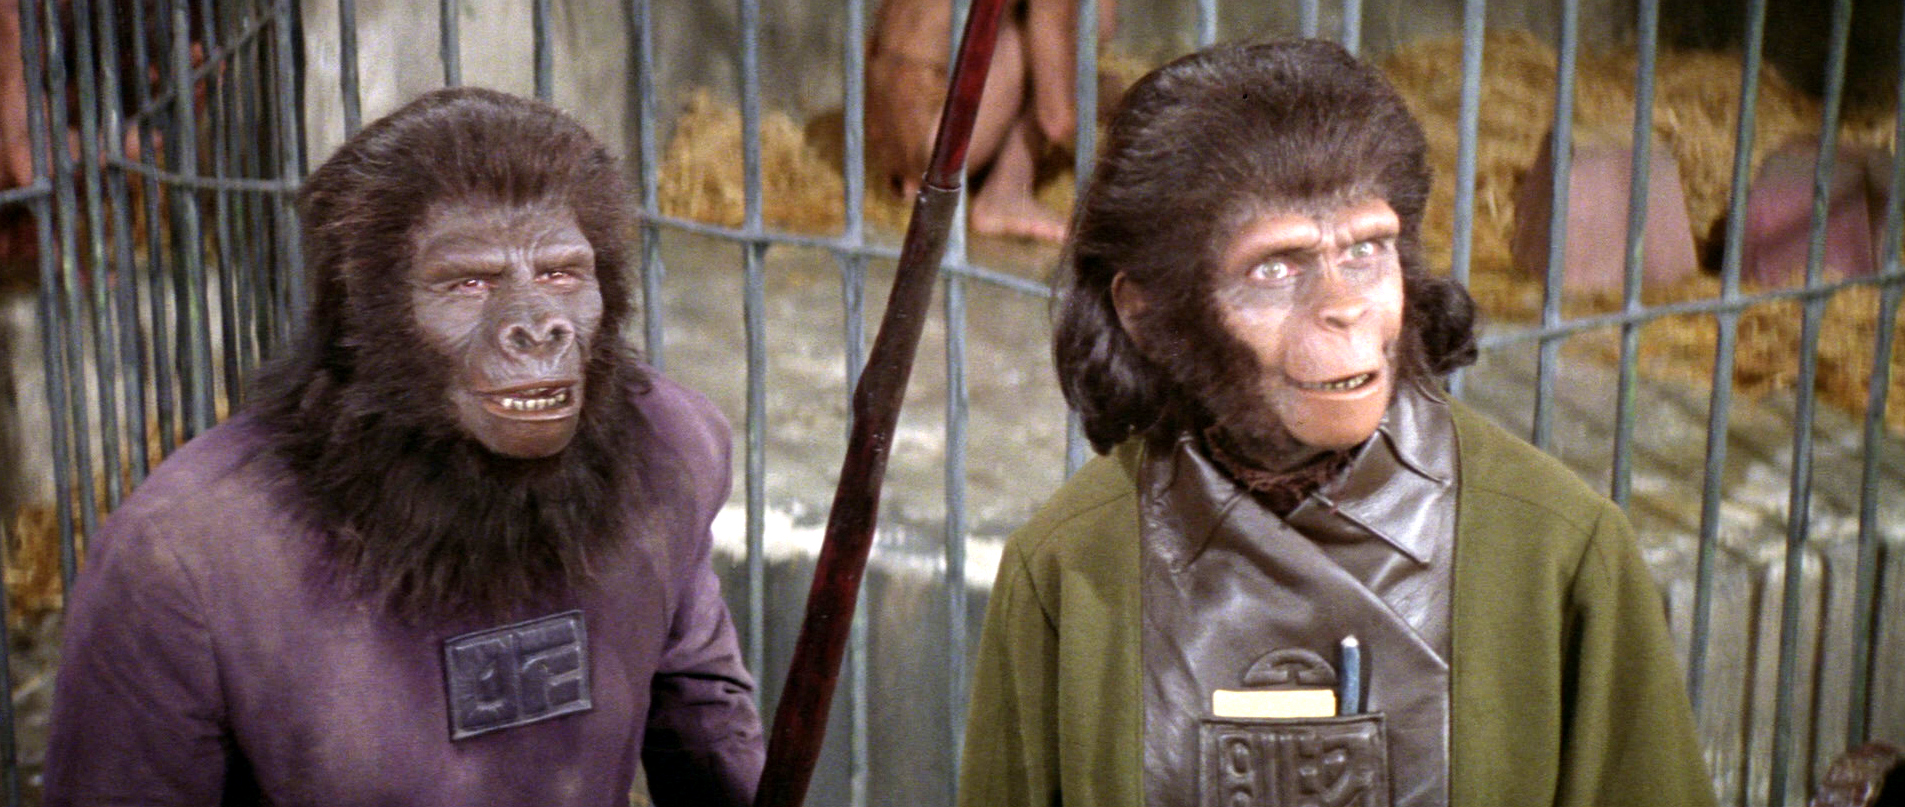 Like Makeup midget monkey consider